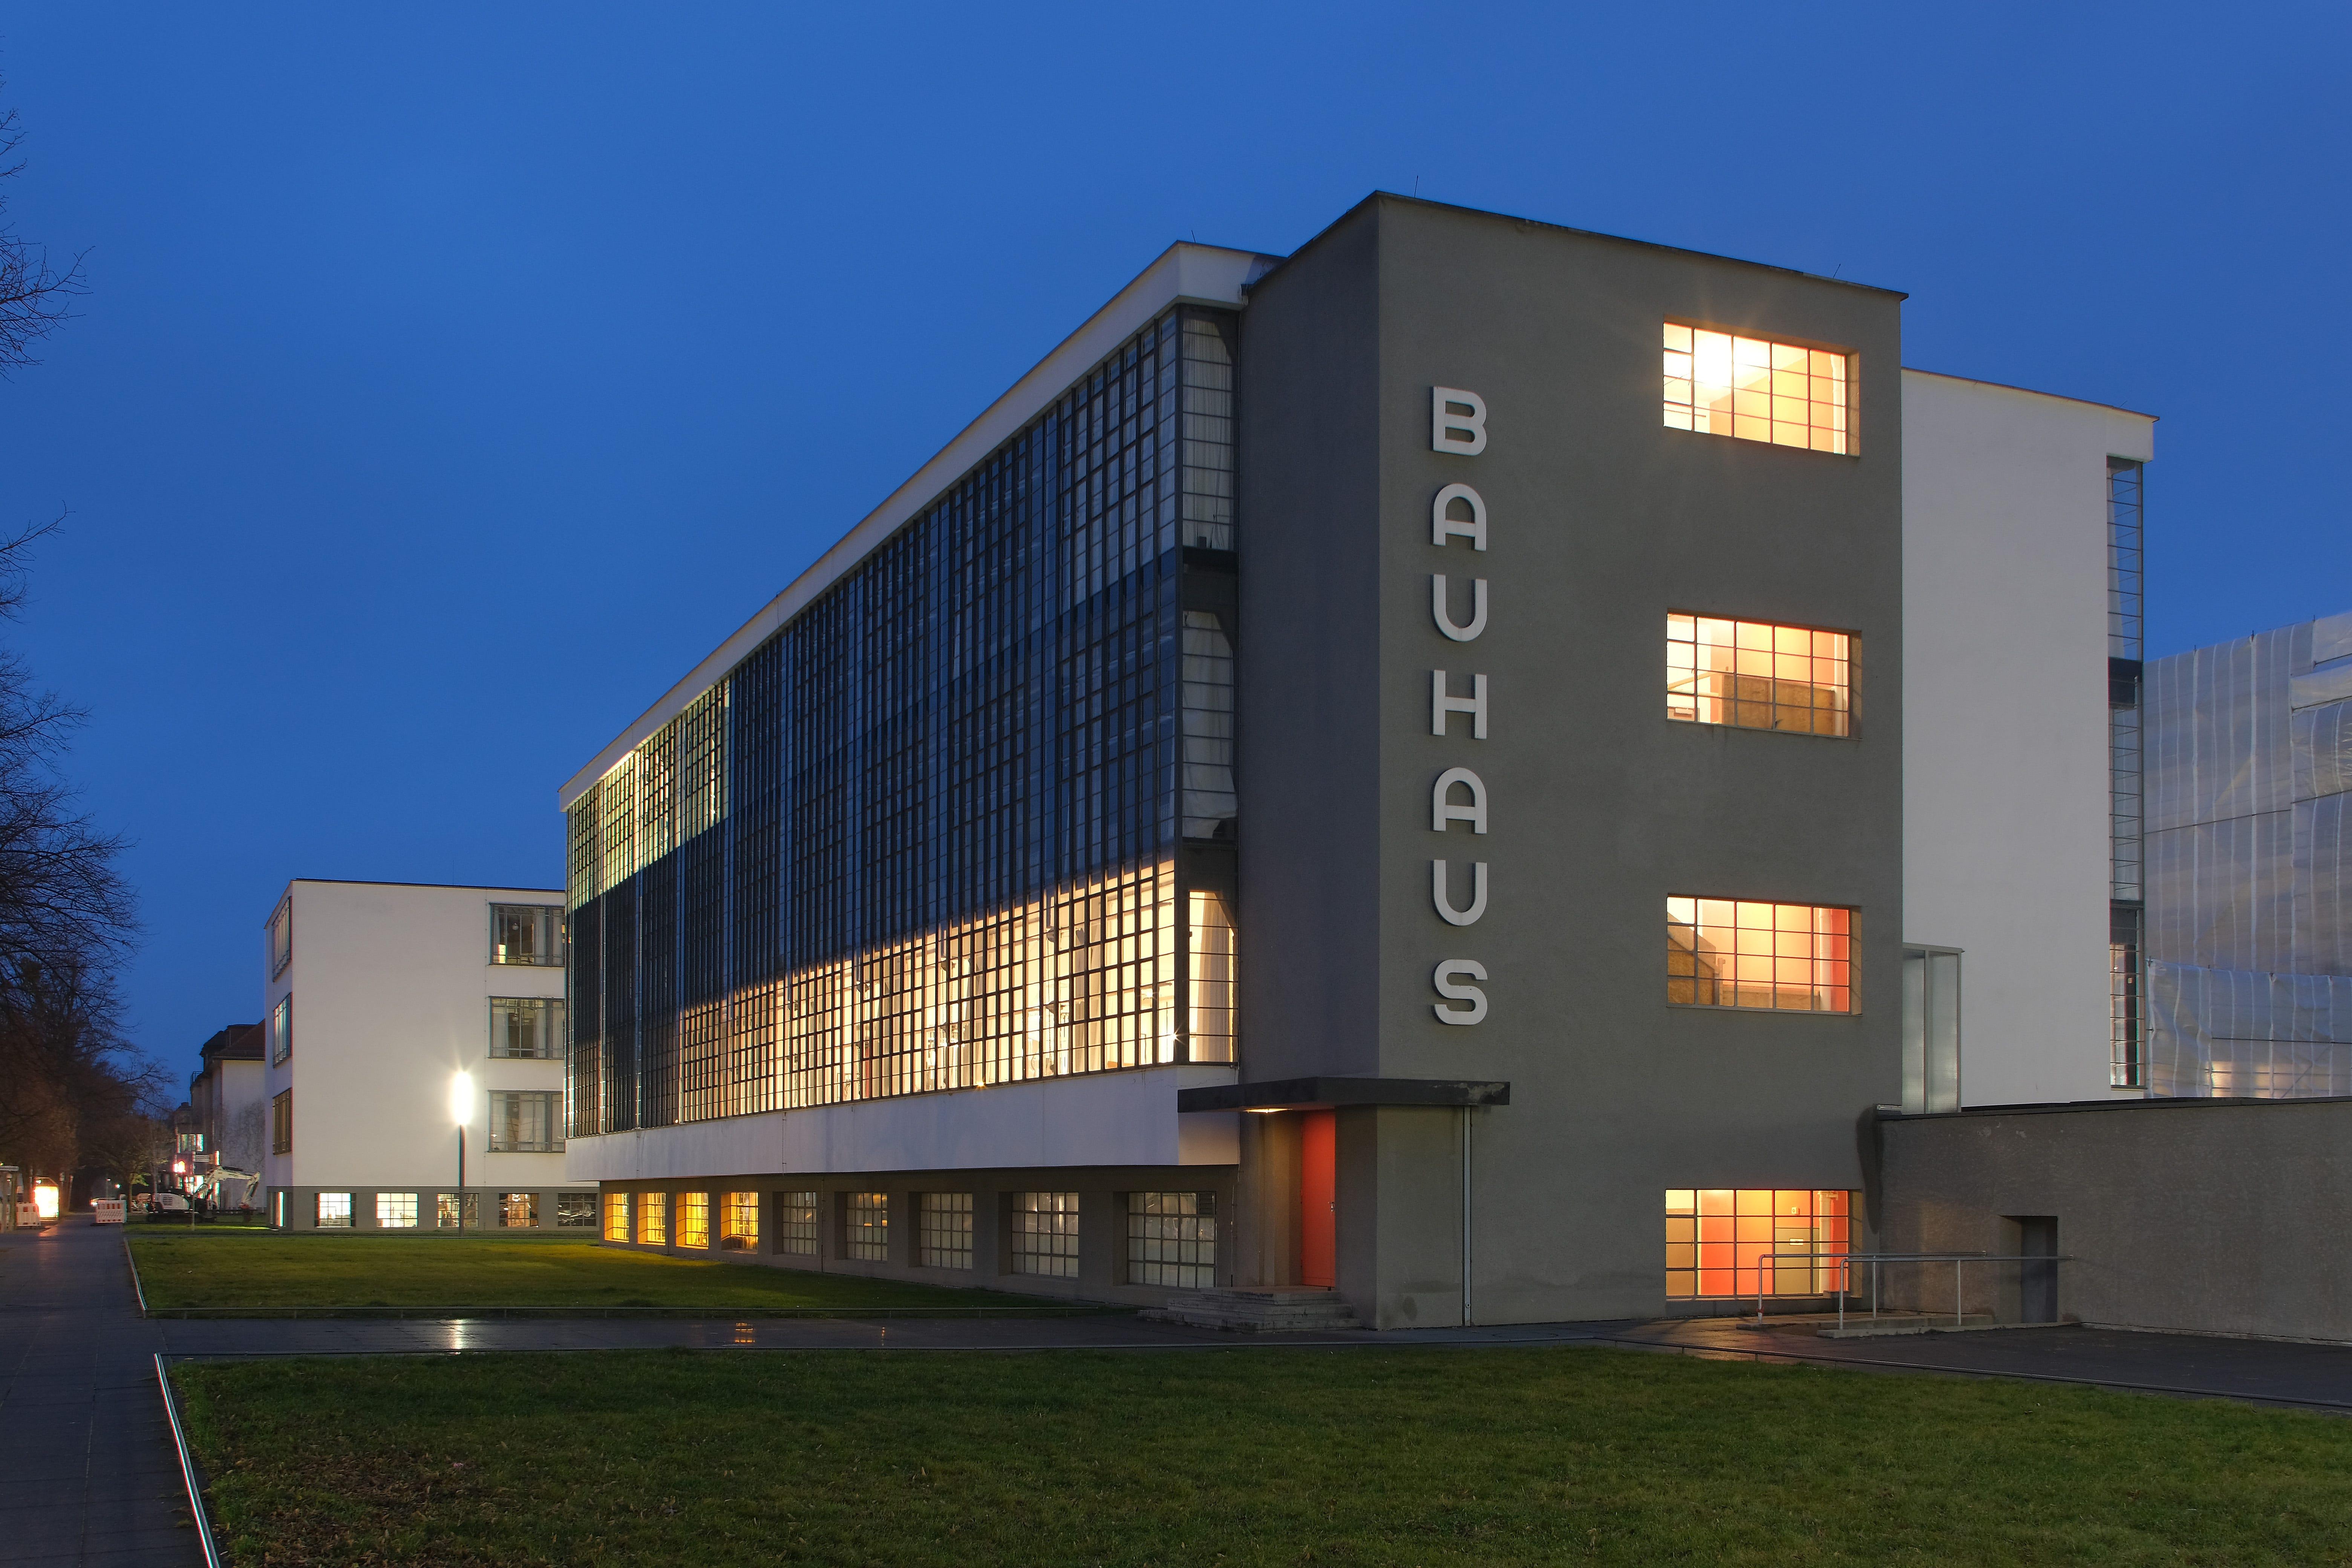 100th anniversary of Bauhaus spotlights influential design movement | USA Today